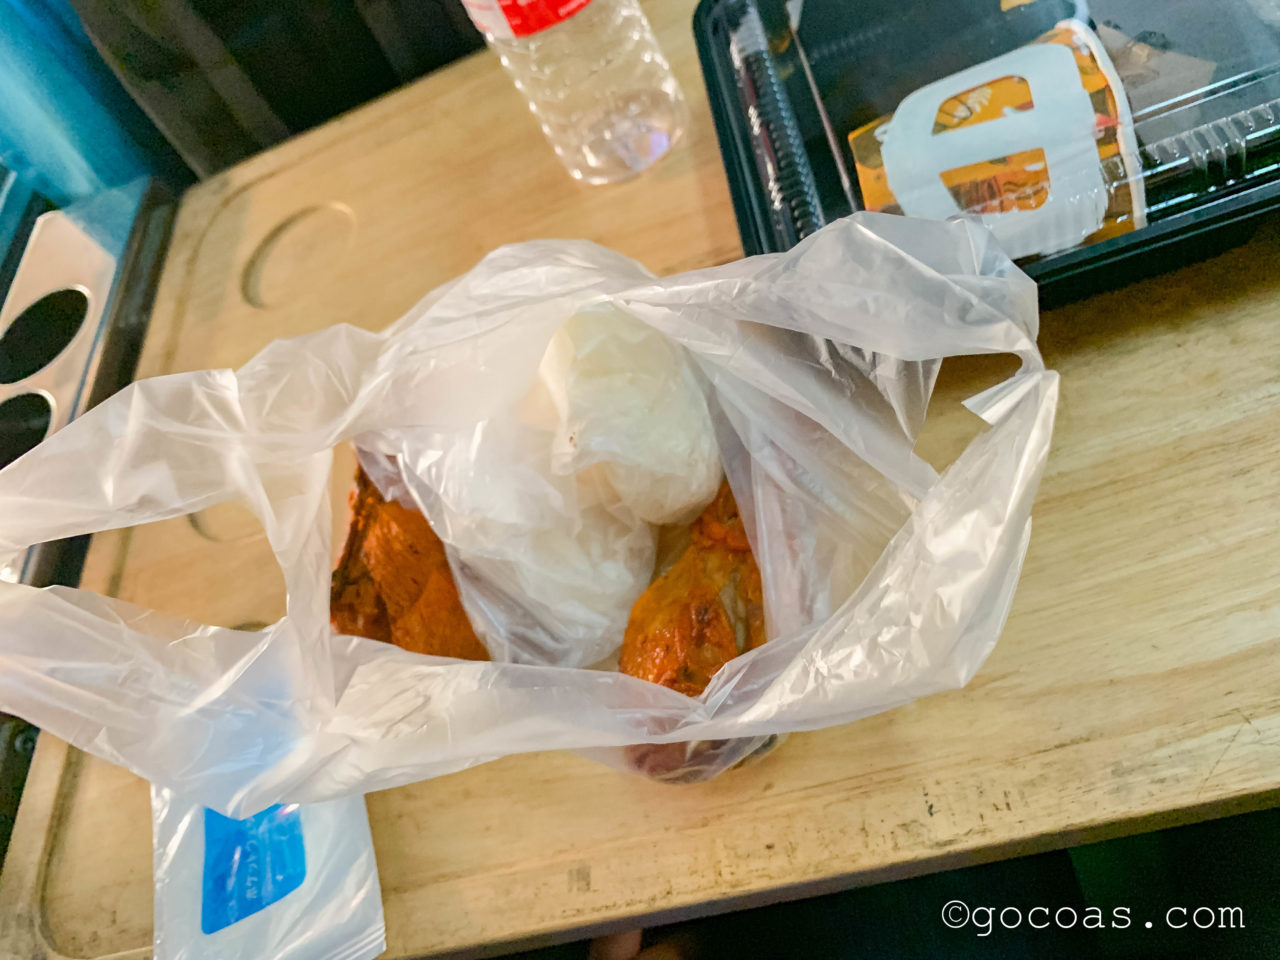 Hua Lamphong駅で乗った電車内の座席で食べた朝ごはんのチキン